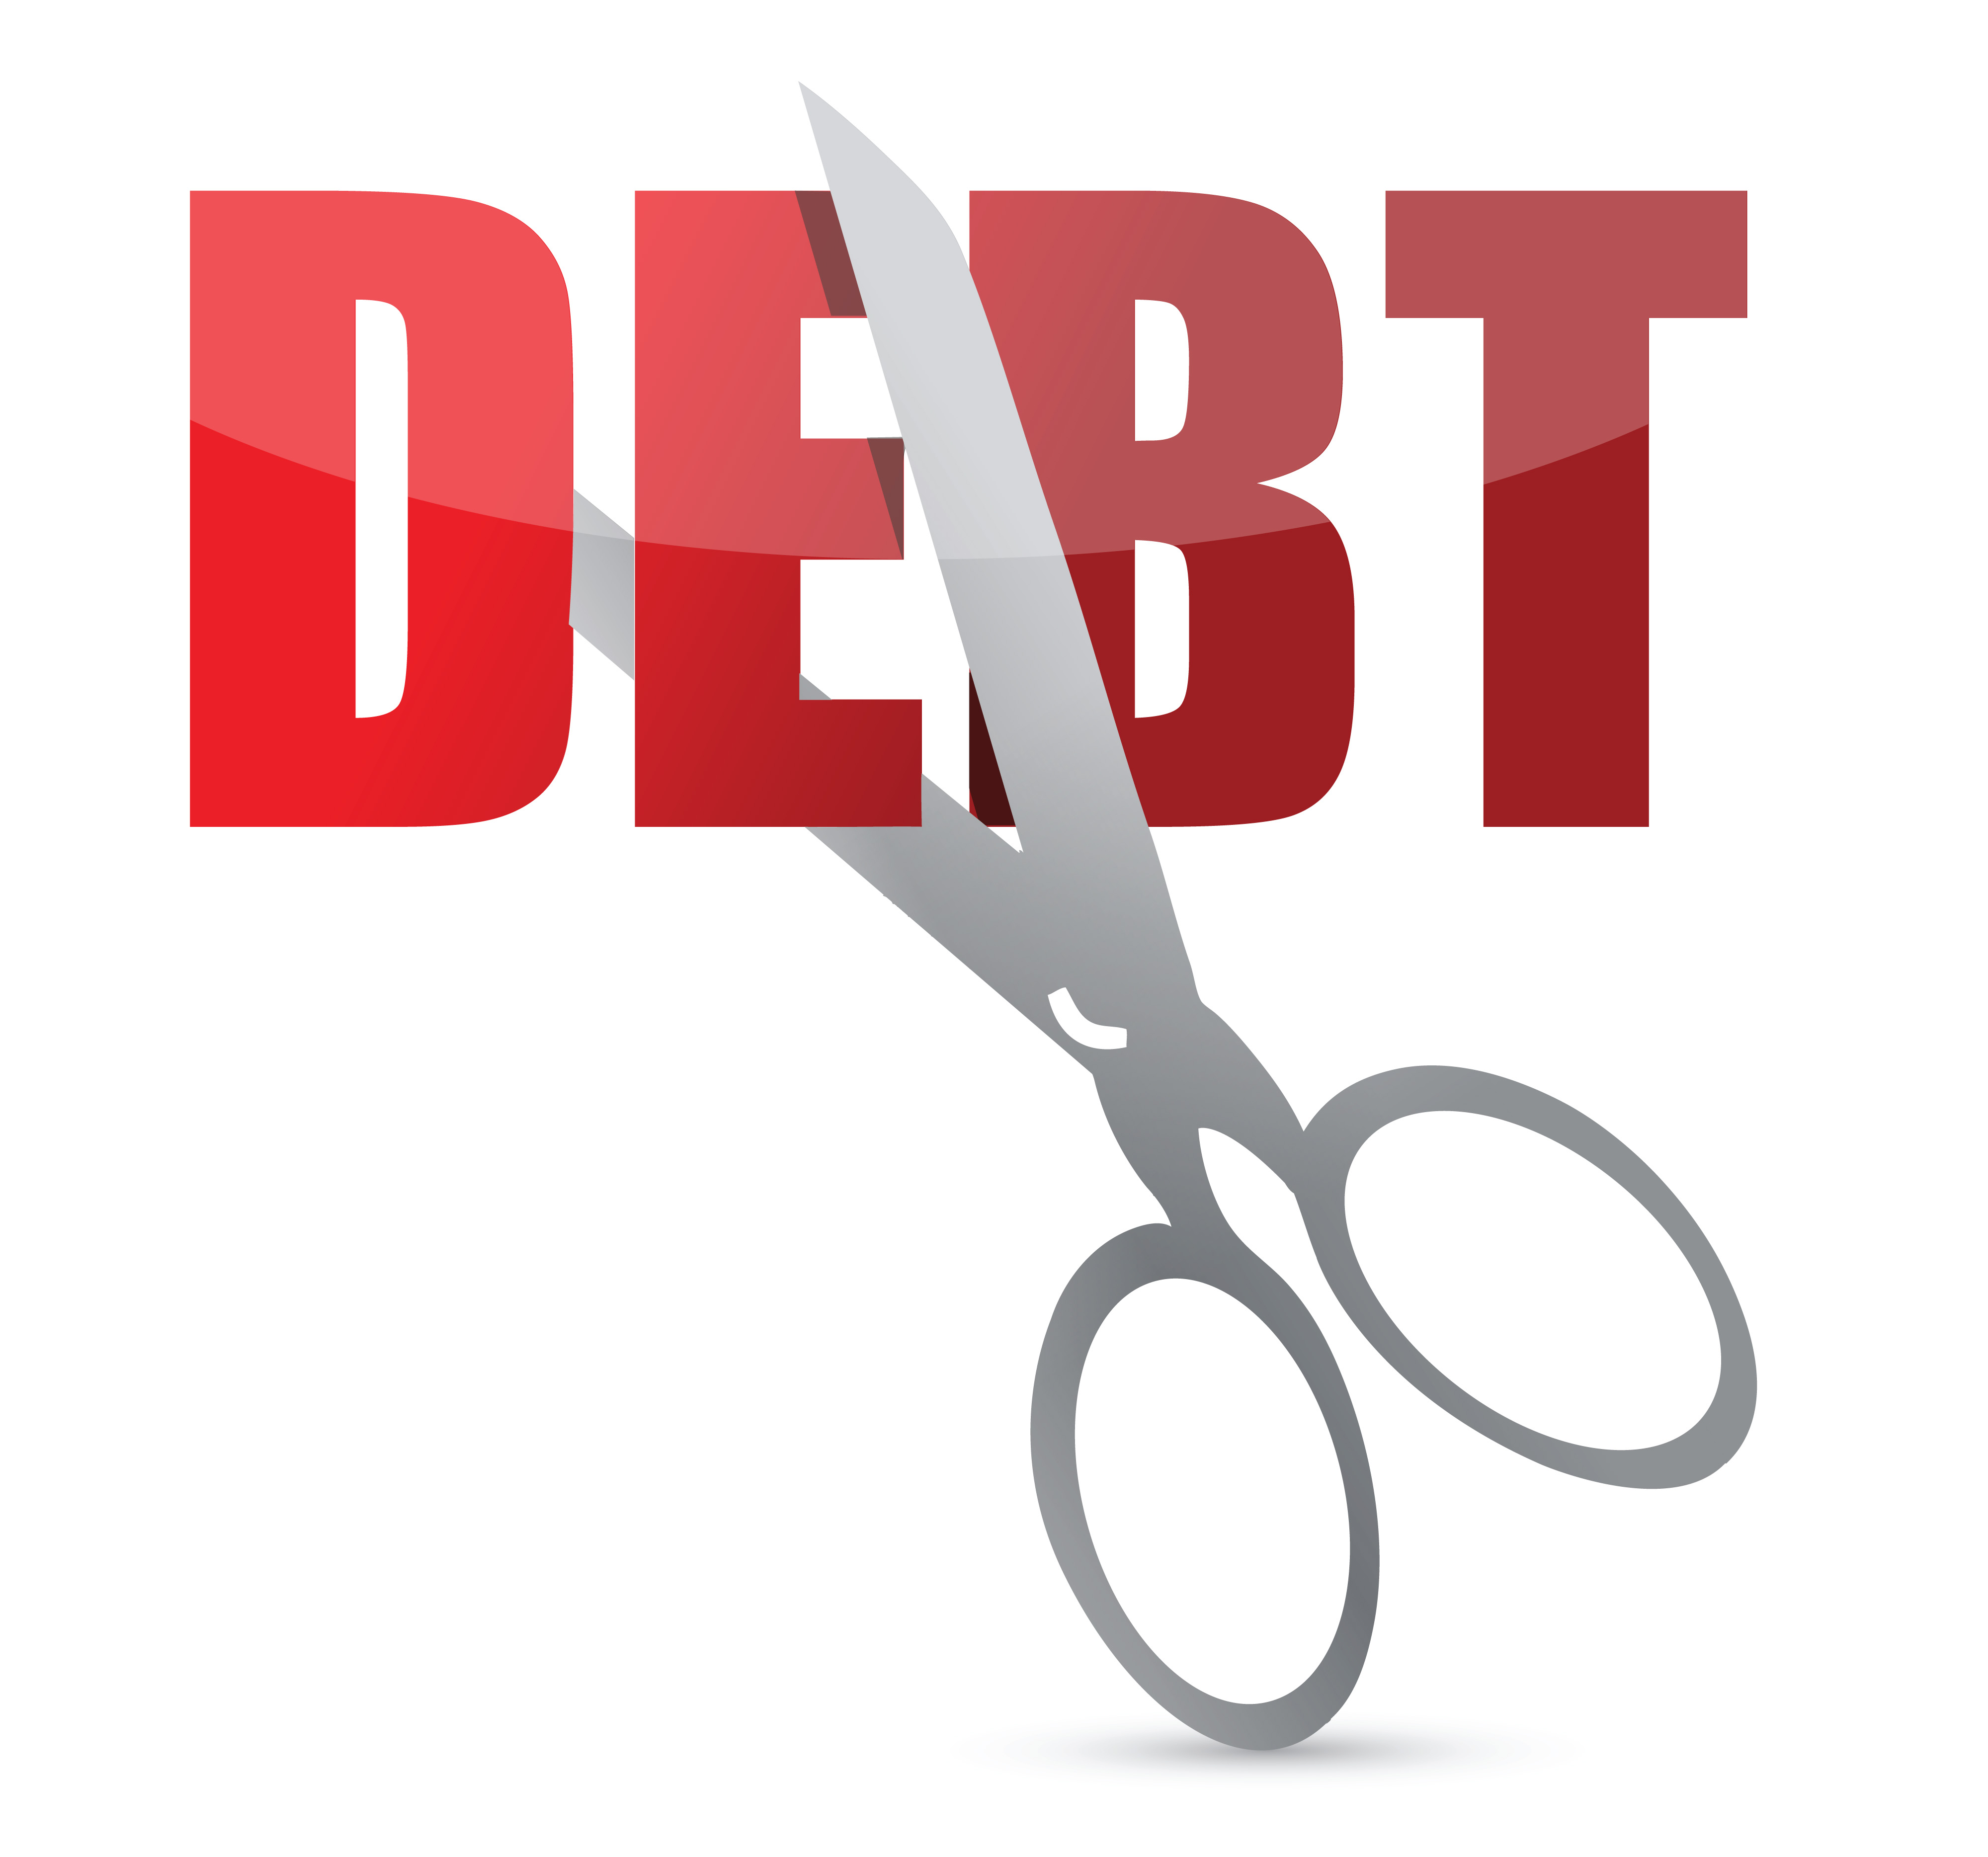 Personal Debt: tacomacreditrepair.onlinecreditstrategies.com/js/personal-debt